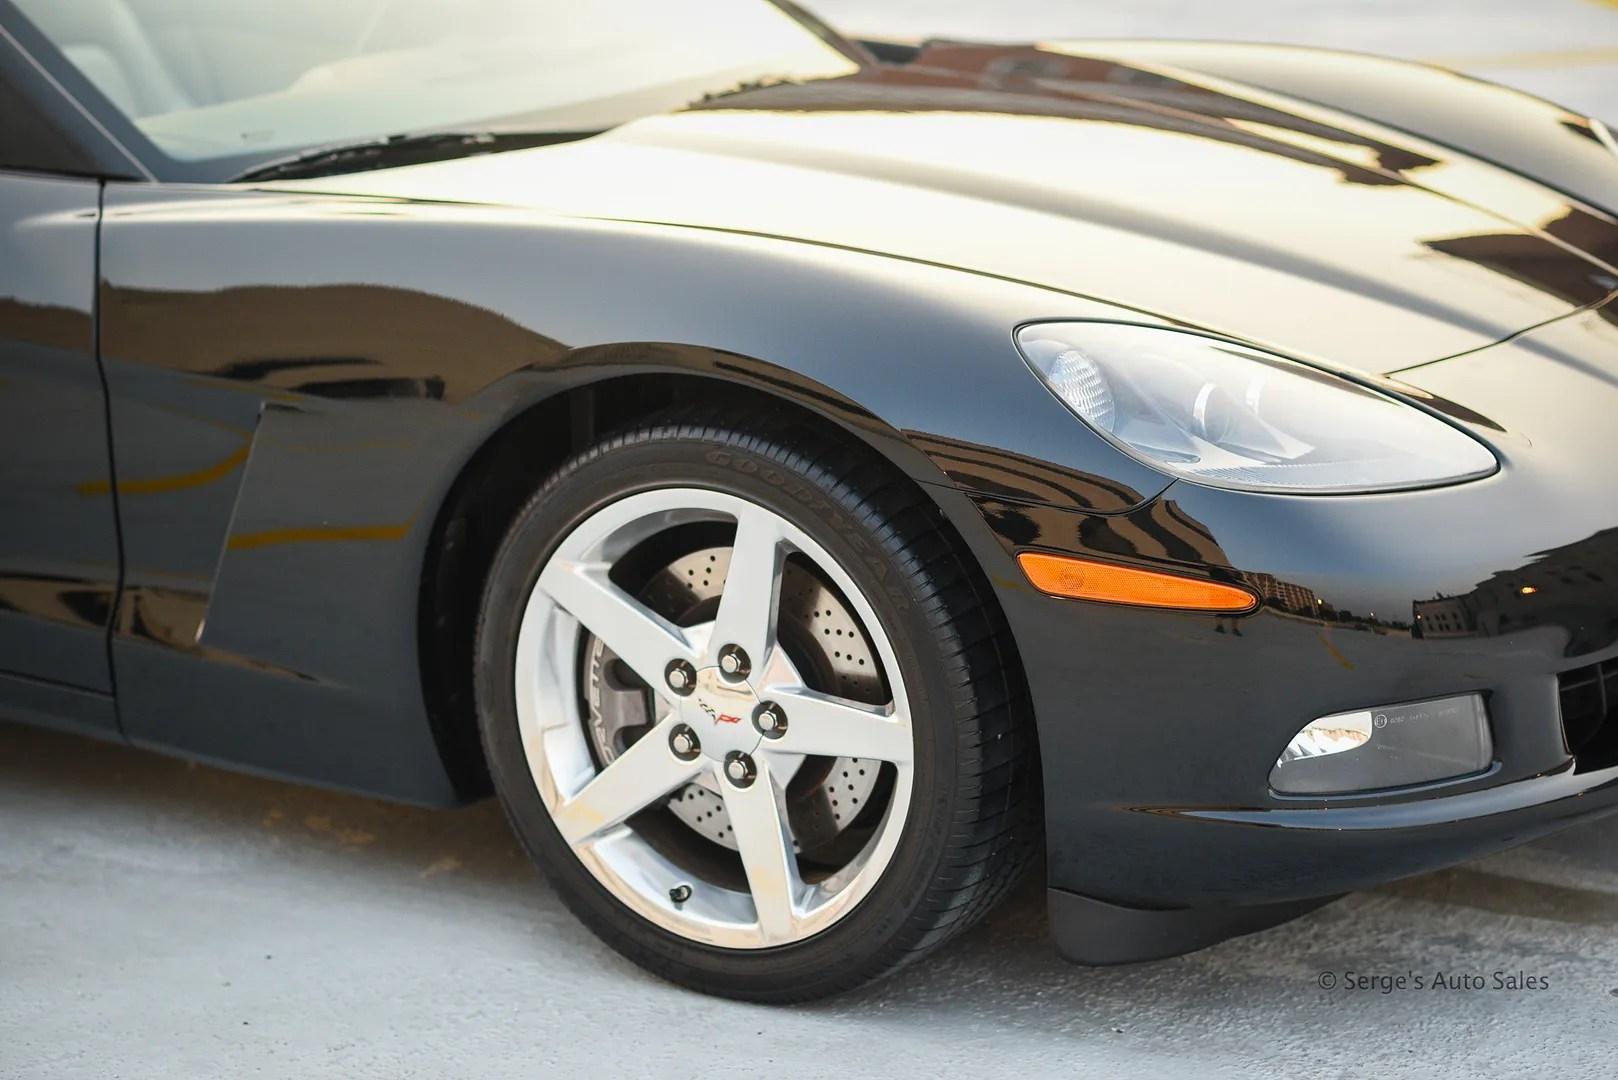 photo 2005-C6-Corvette-Convertible-For-Sale-Scranton-Serges-Auto-Sales-dealer--44_zpsza9bglga.jpg